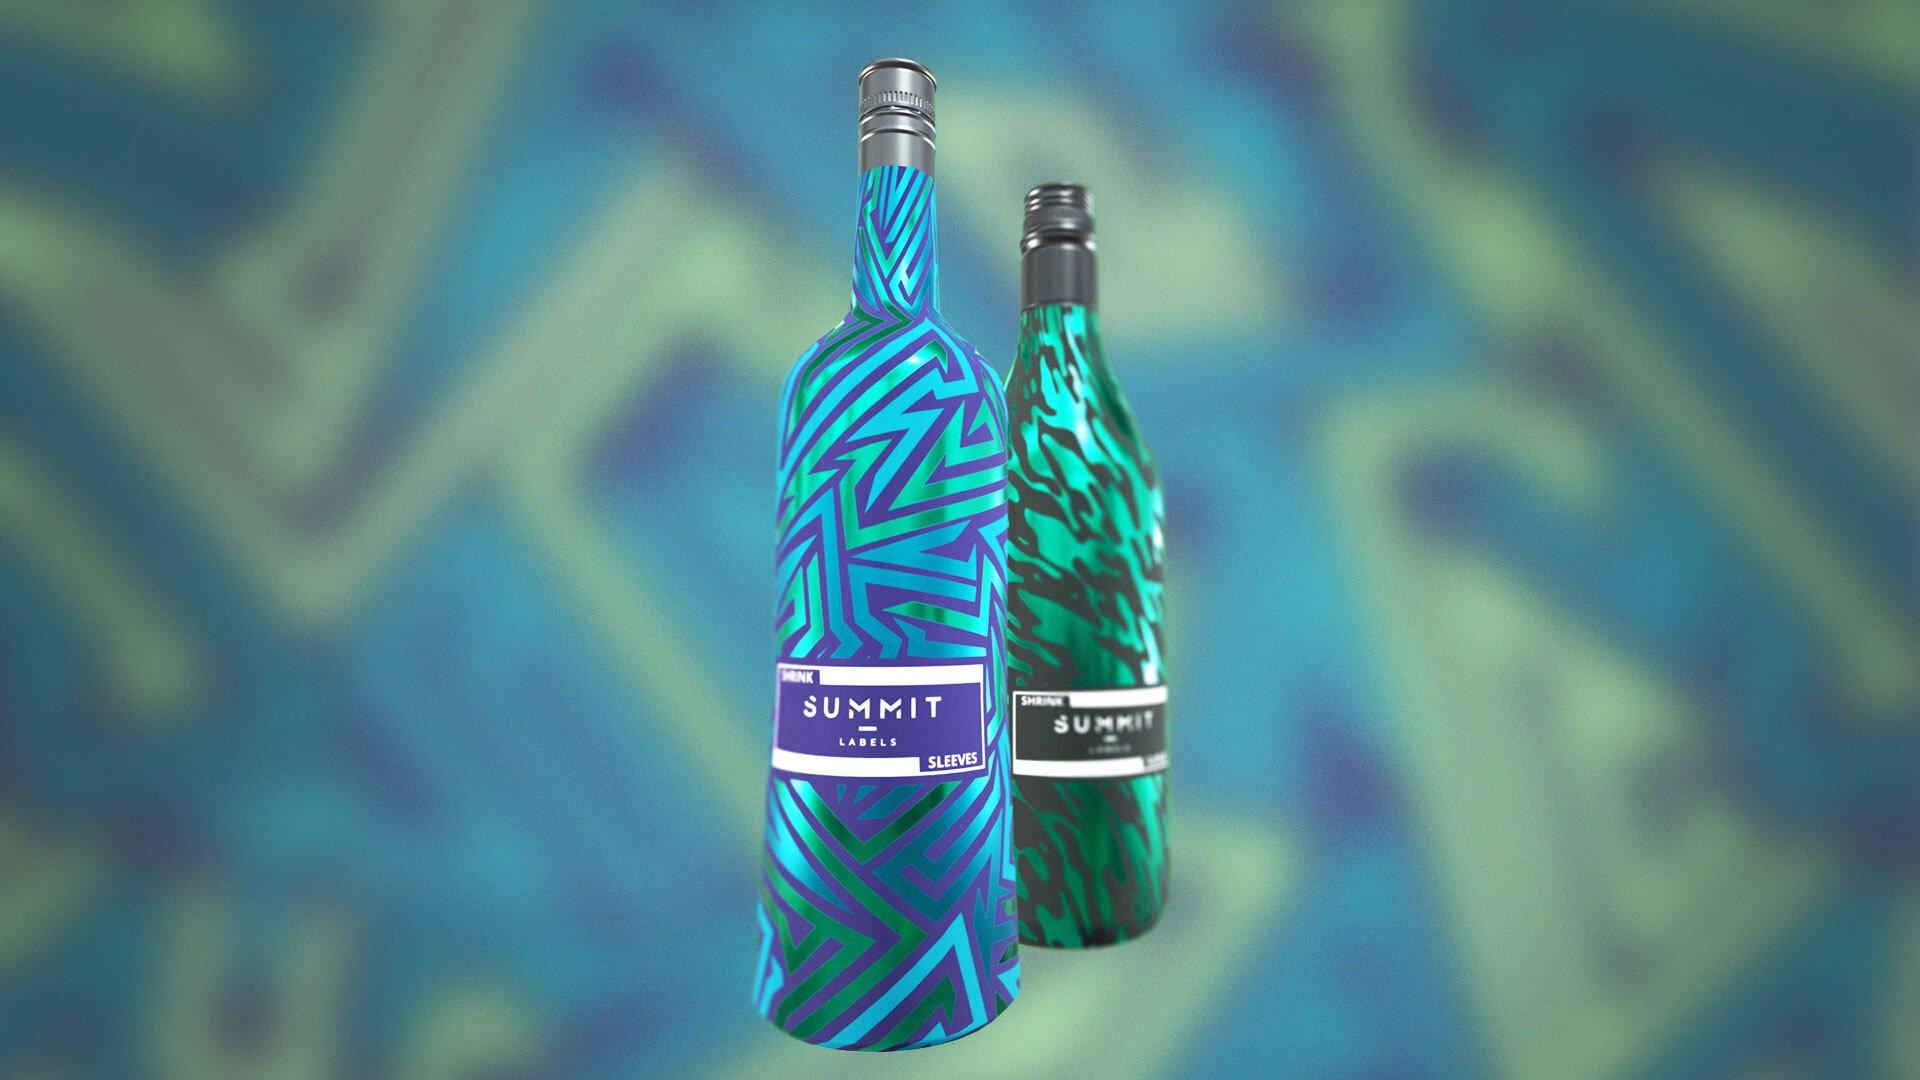 SummitLabels_ShrinkSleeves_Bottles_BG